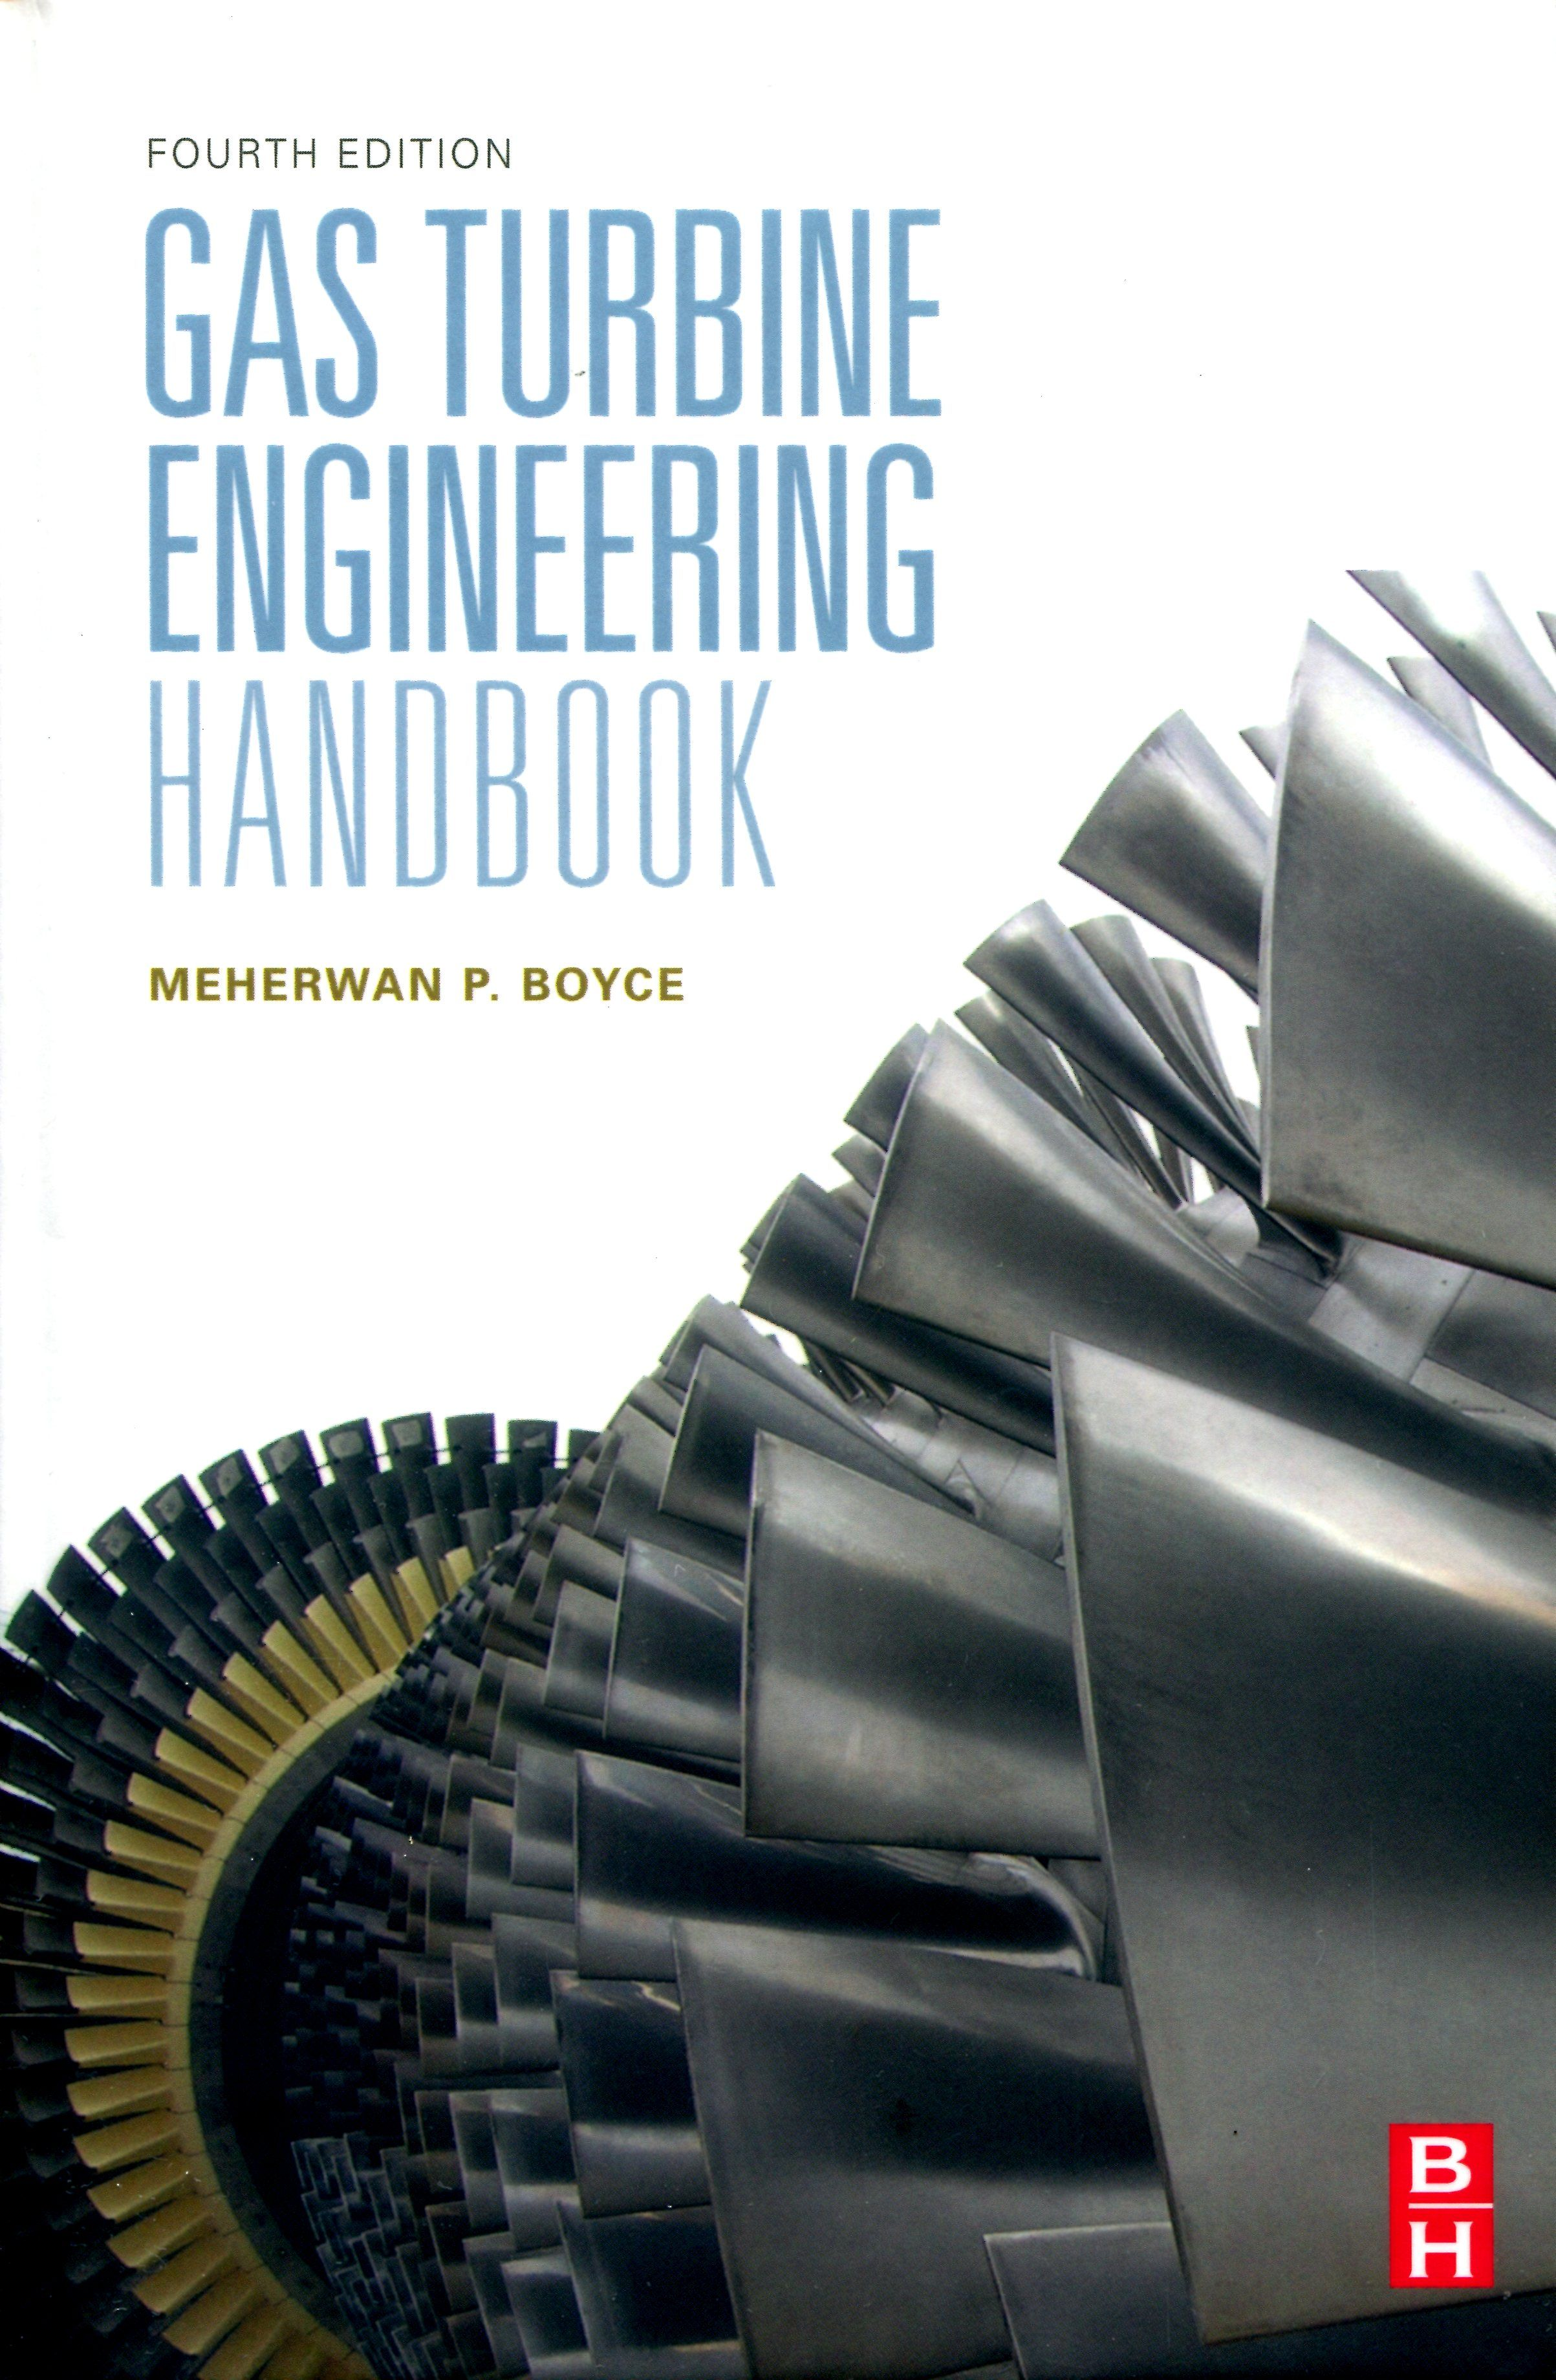 Gas turbine engineering handbook [Libro] Meherwan P Boyce